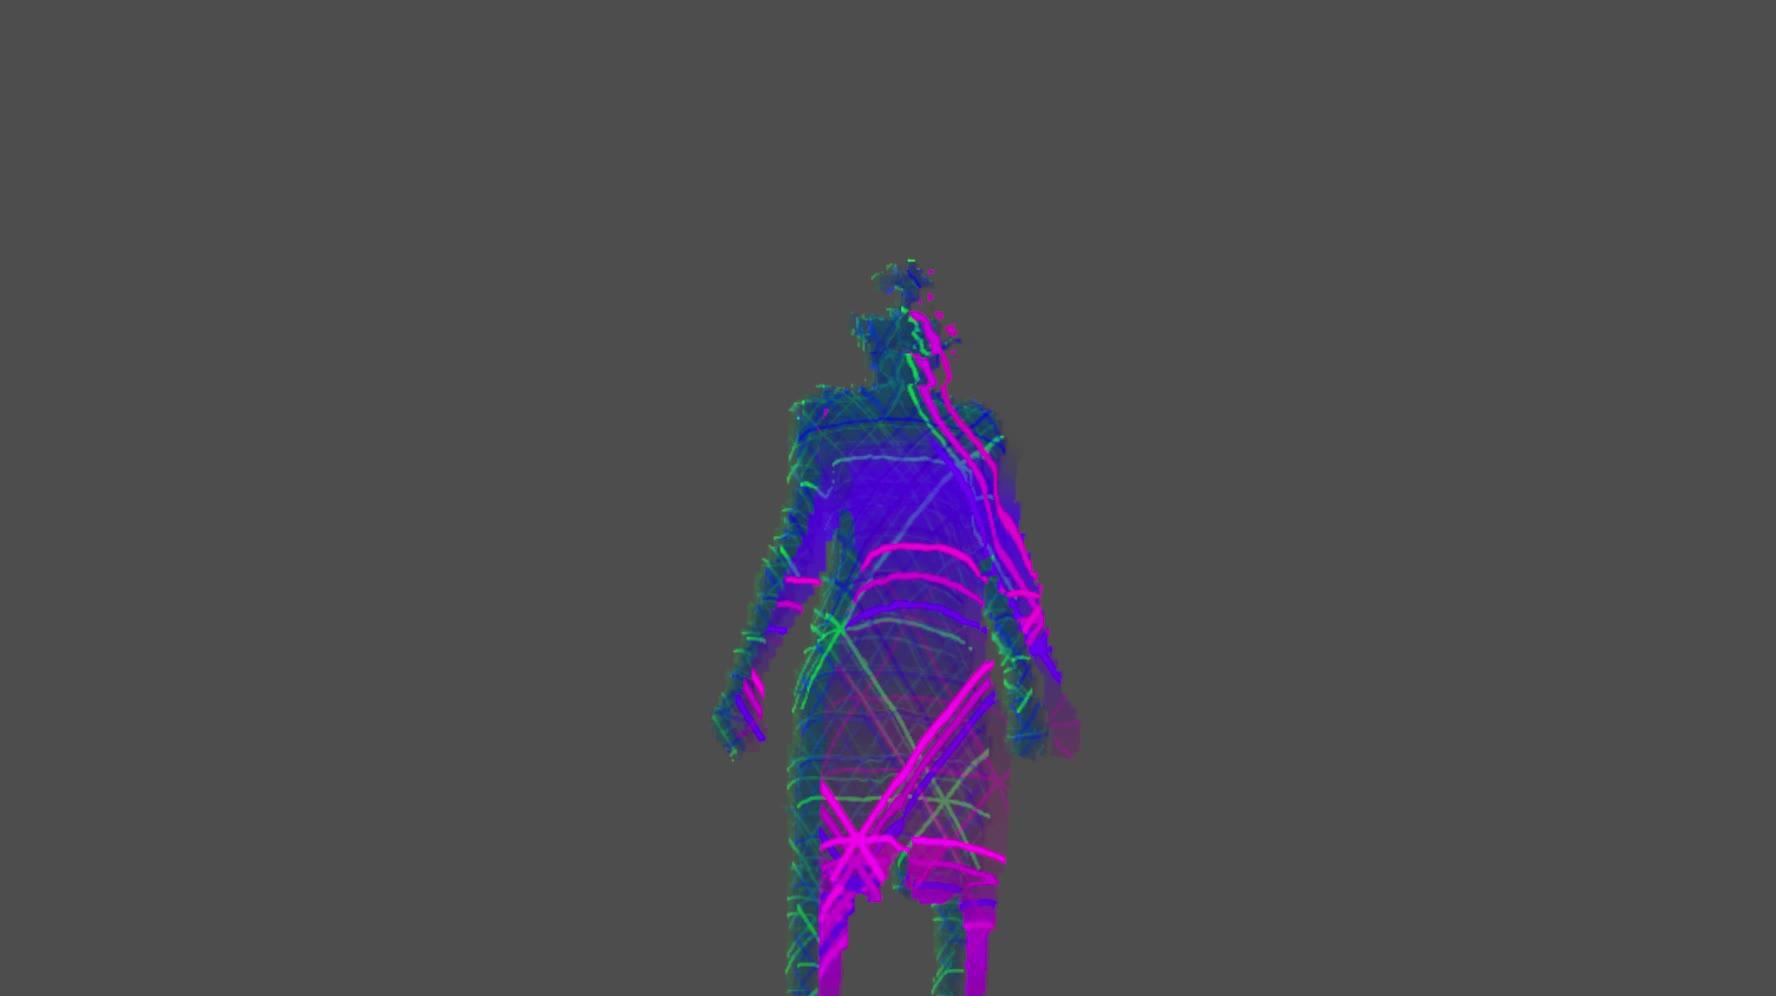 colors, digitalart, digitalpainting, immersiveart, kinect, psychedelic, spacepainting, virtualreality, vr, prayer GIFs